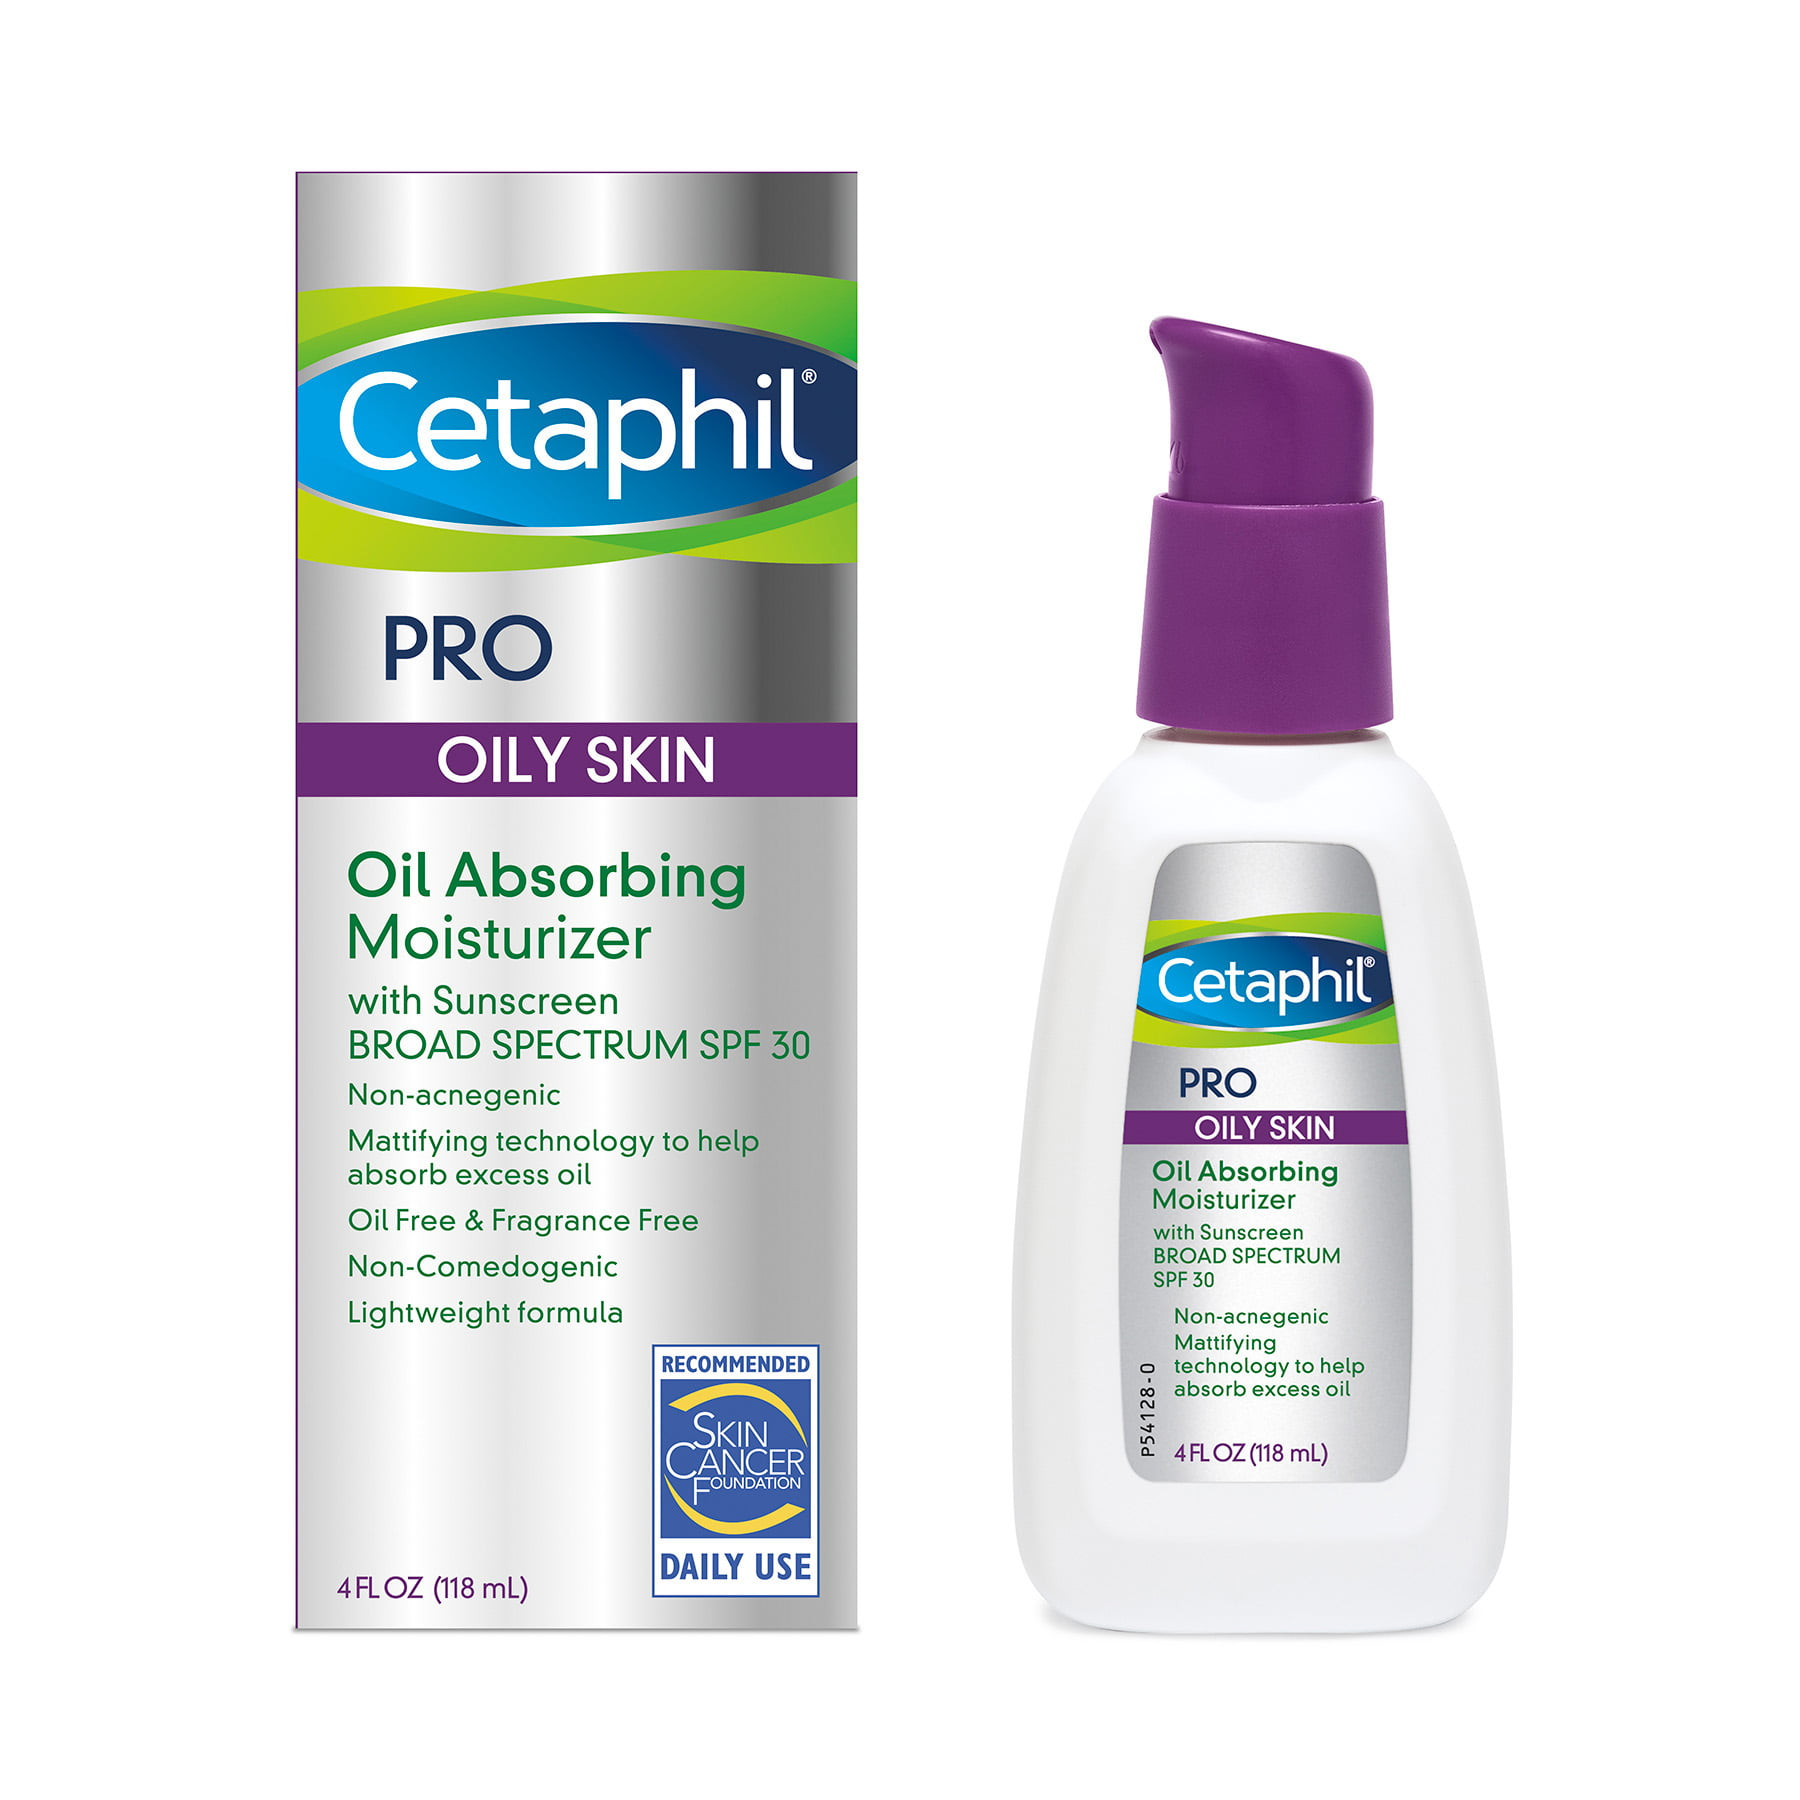 Cetaphil Pro Oil Absorbing Moisturizer Spf 30 4oz